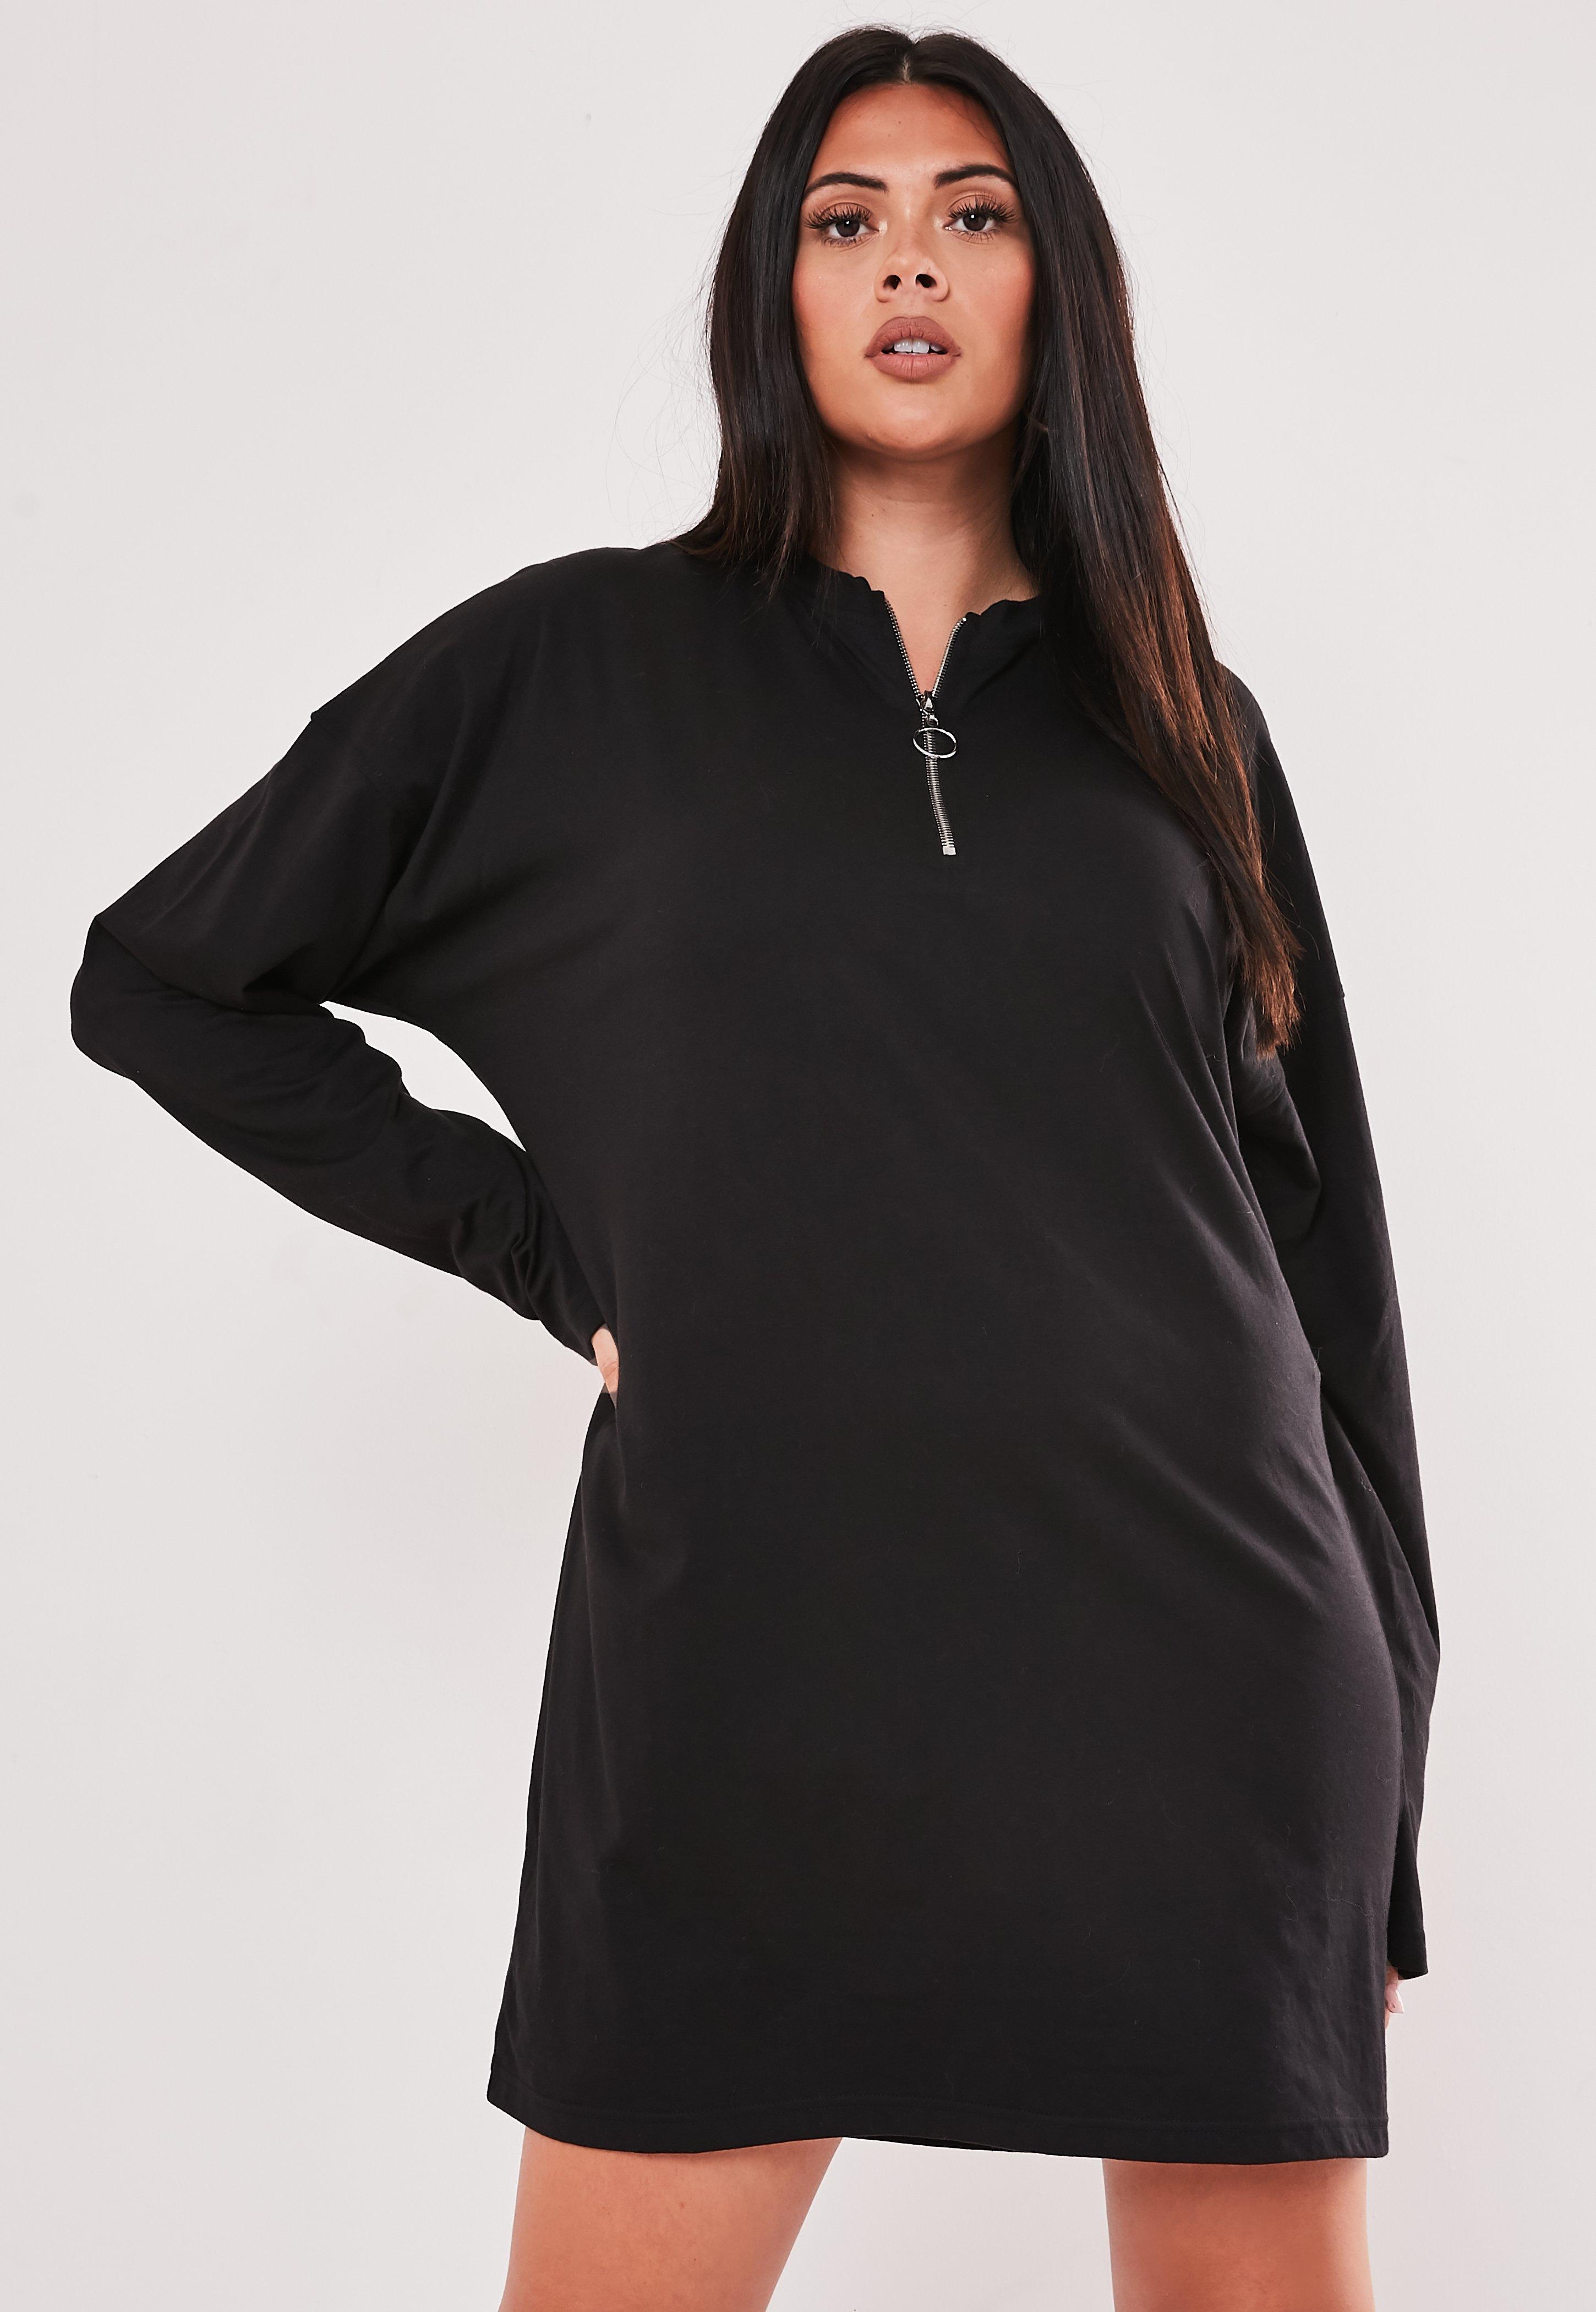 Plus Size Black Zip T Shirt Dress